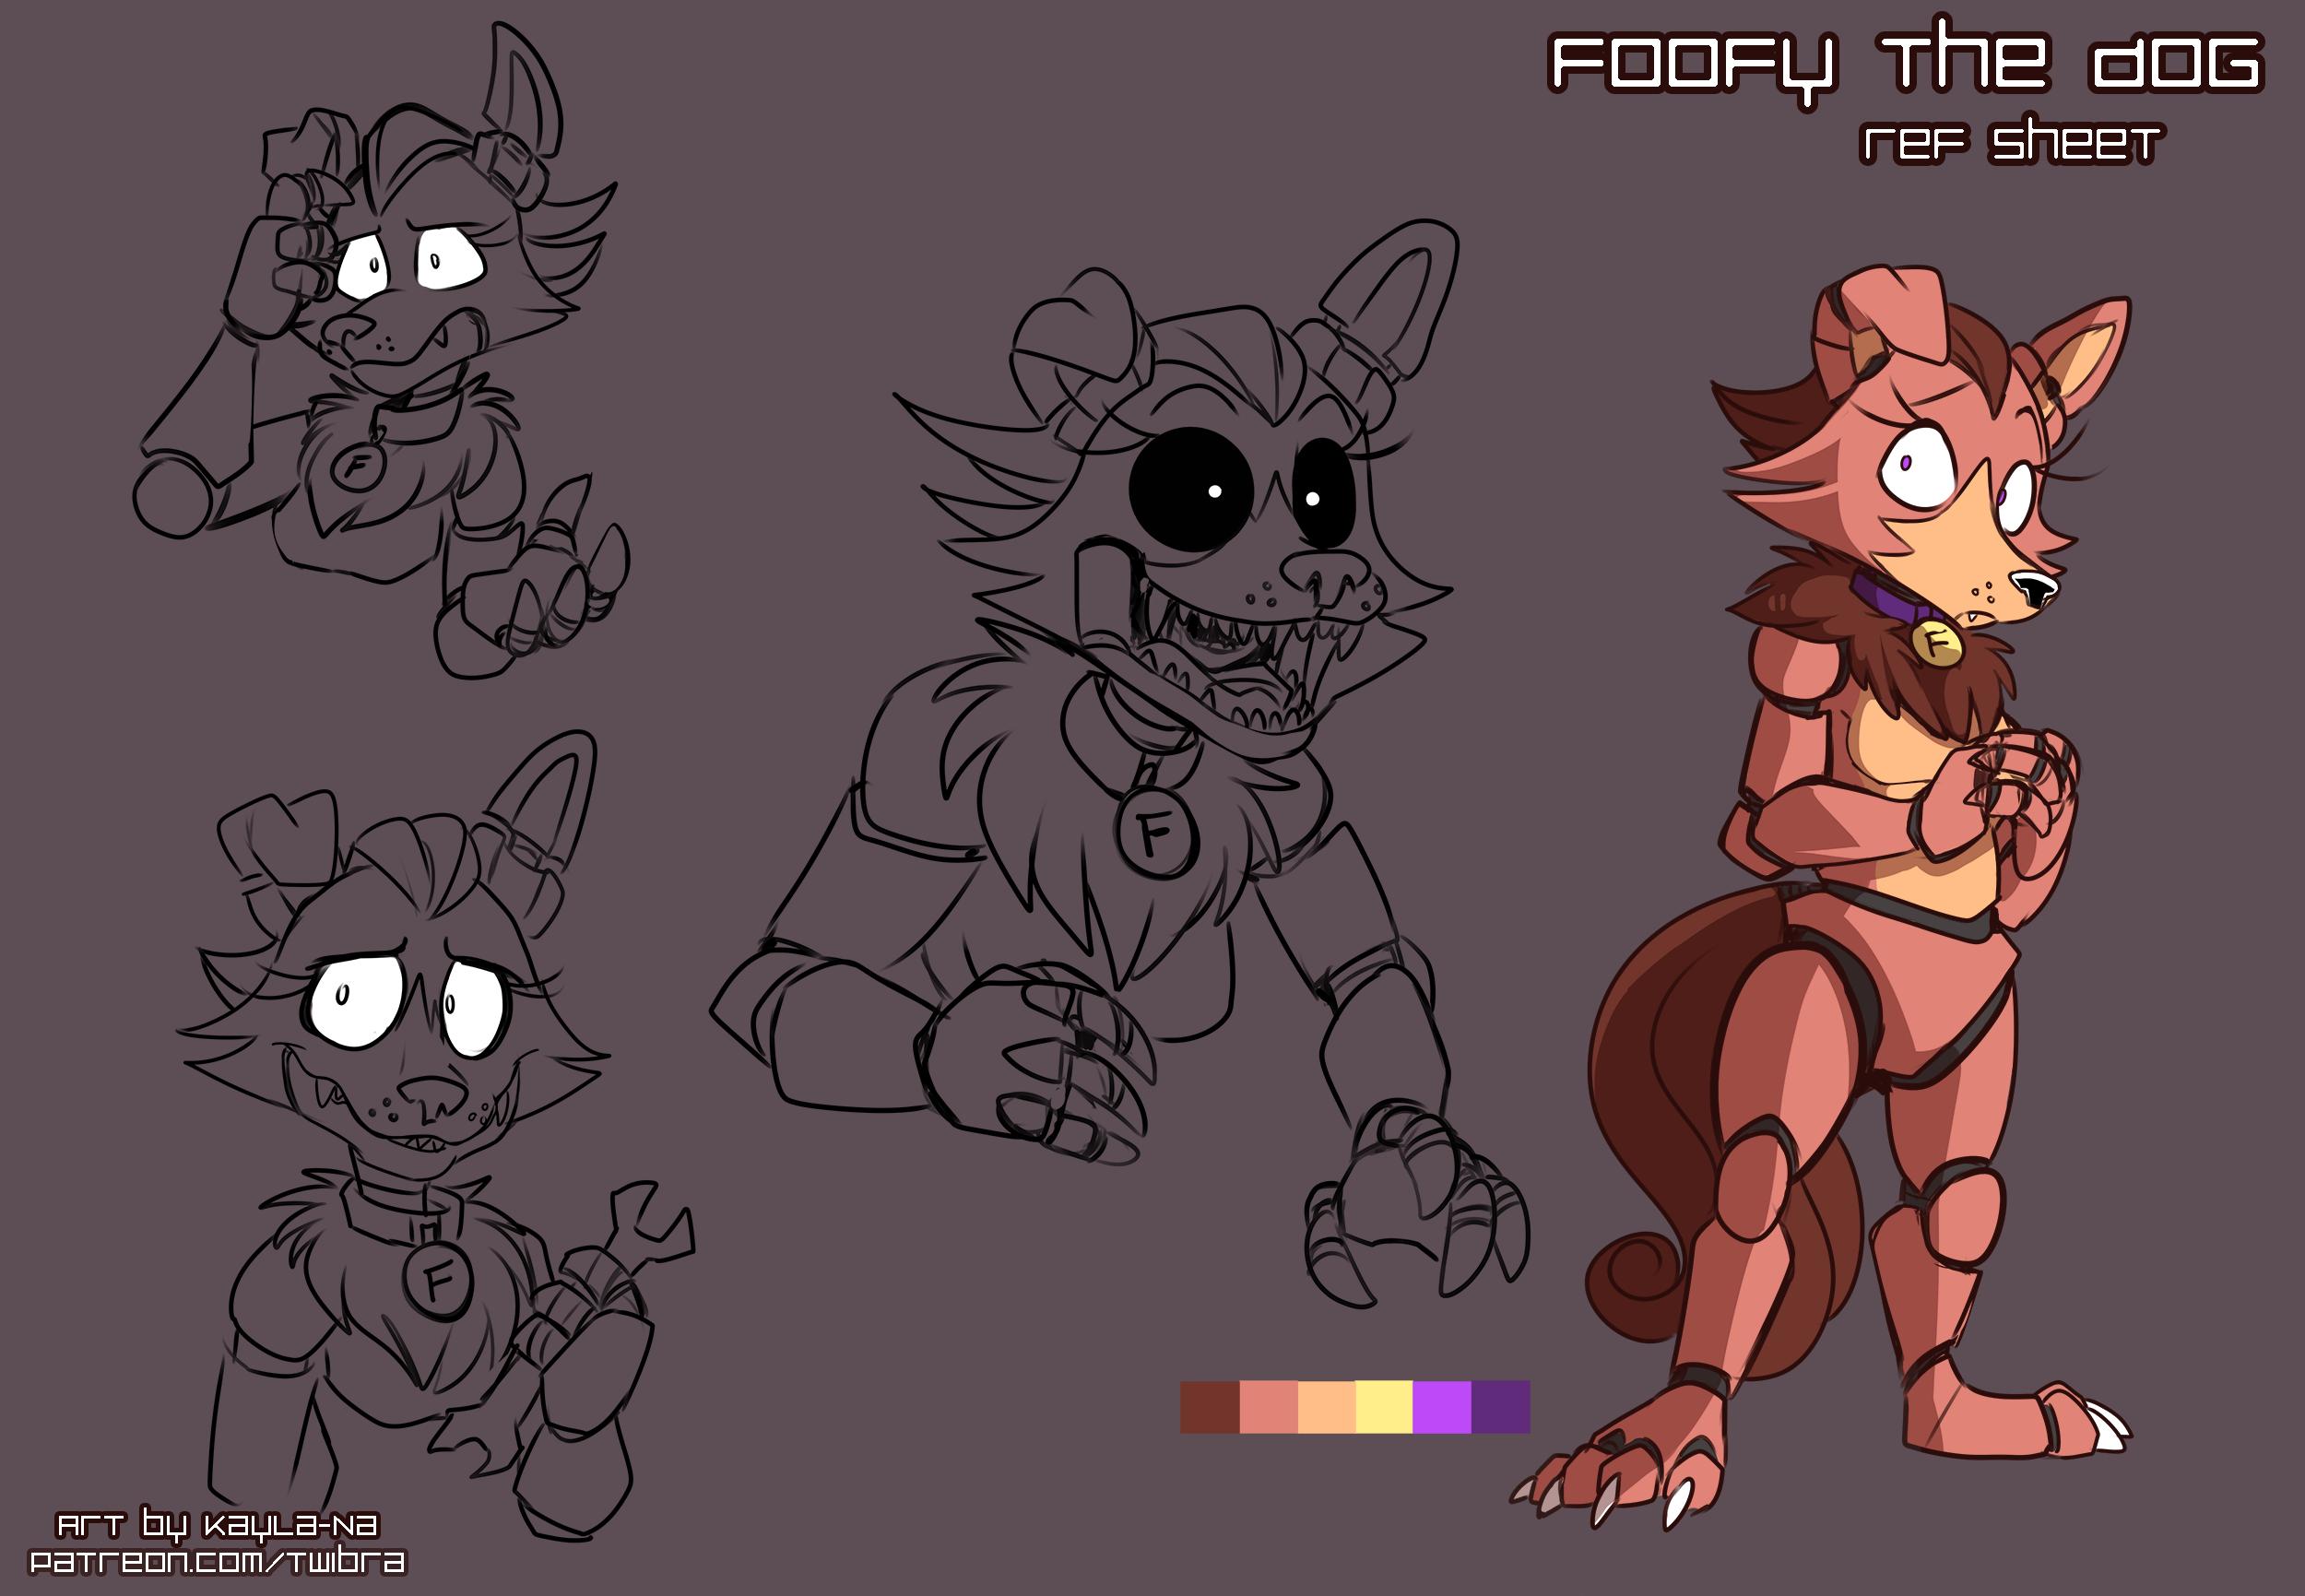 FNAF - Foofy the Dog: Ref Sheet